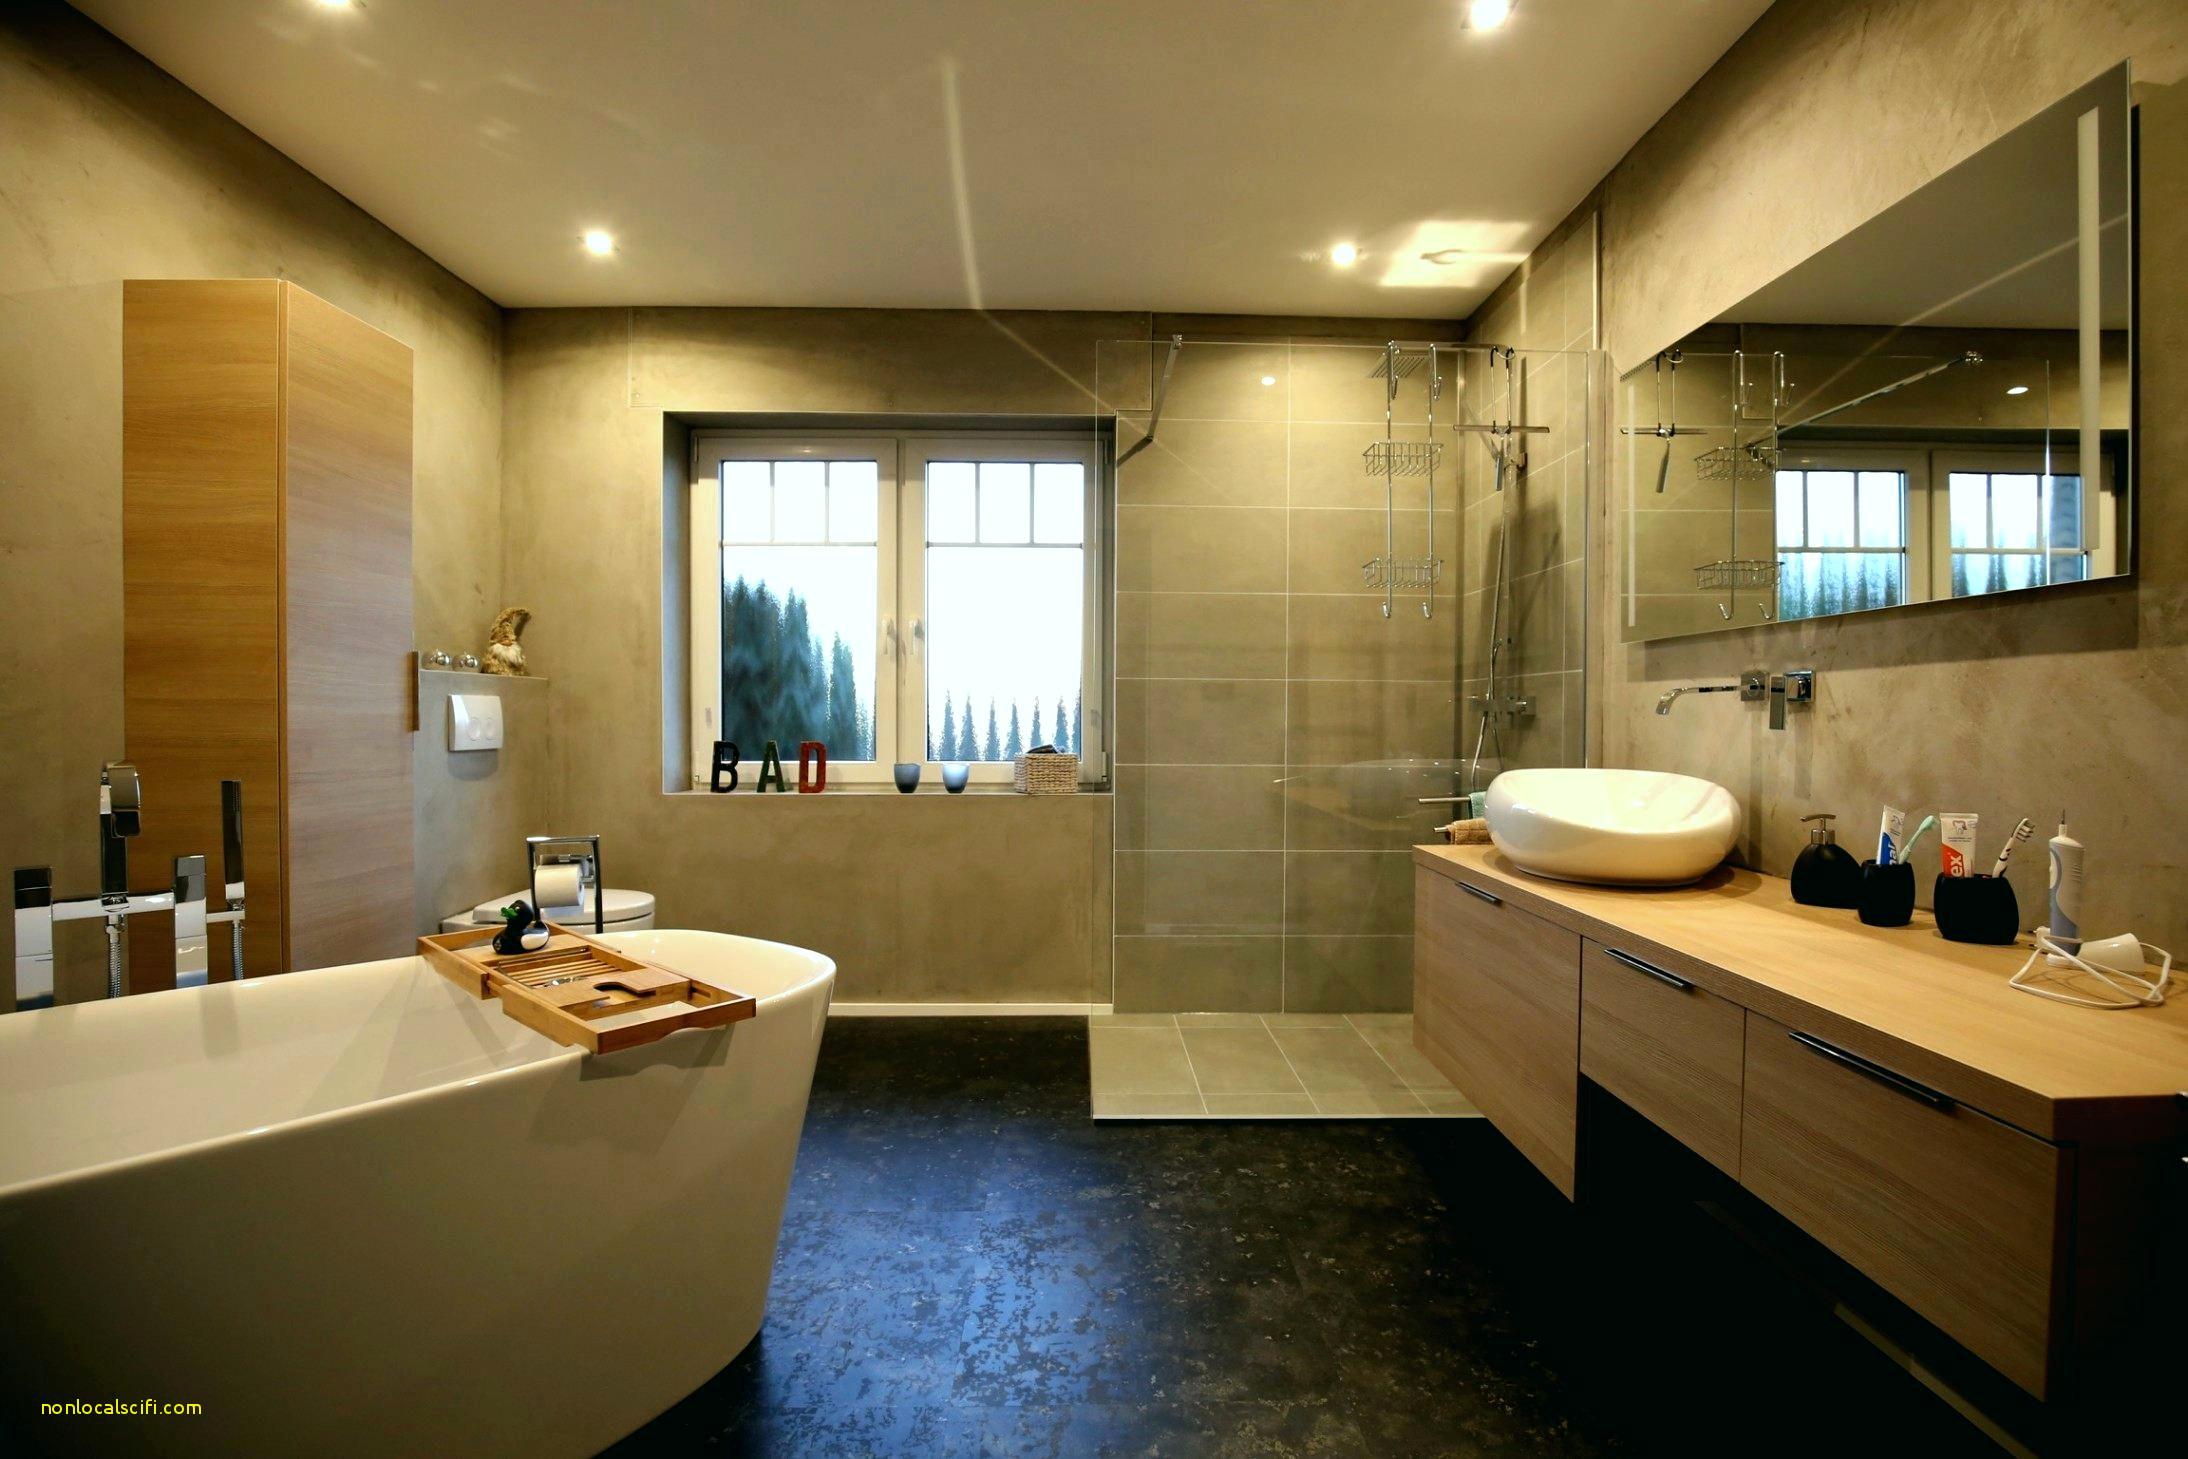 Salle De Bain Synonyme Luxe Photographie Résultat Supérieur 100 Incroyable Salle De Bain Meuble Pas Cher